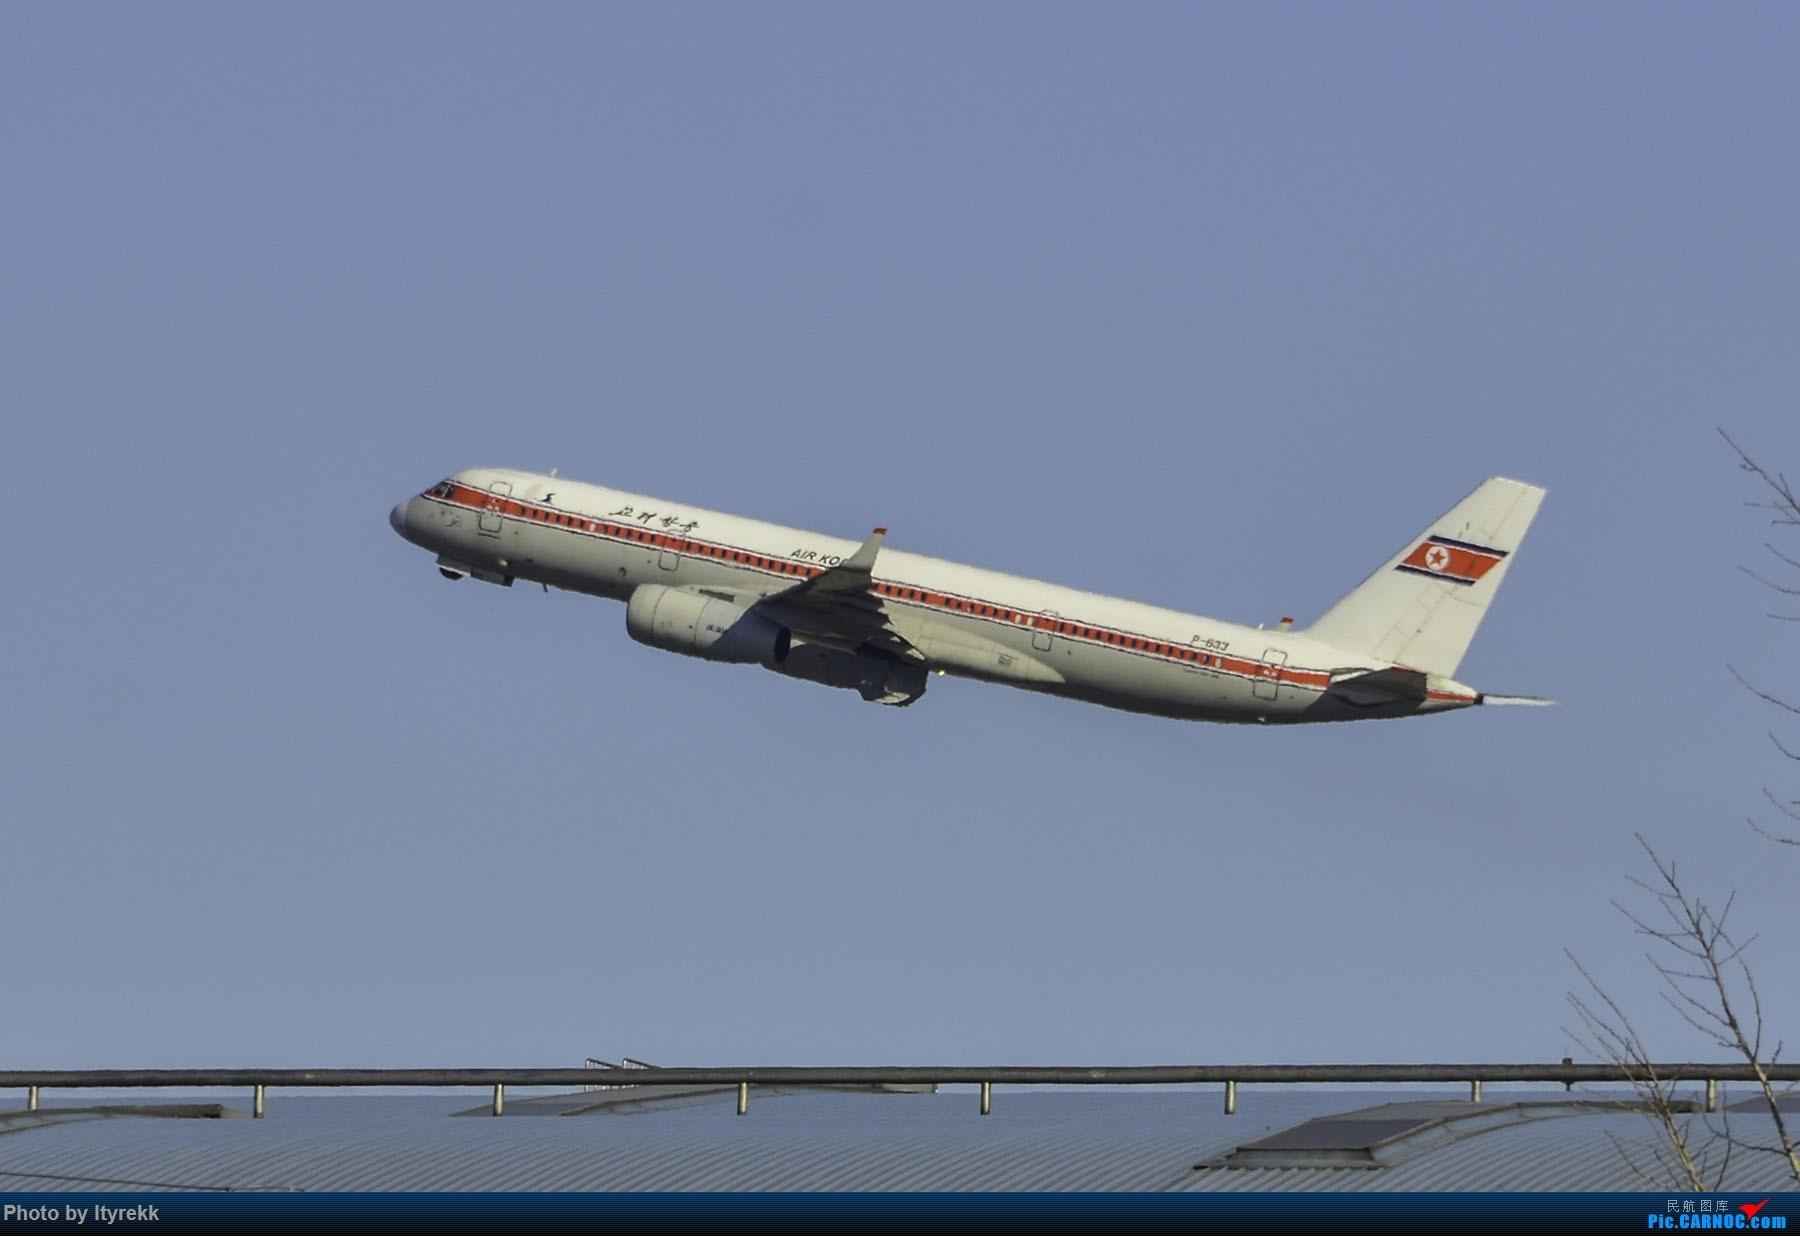 Re:[原创]PEK一日游 收获厦航首架789 B-1566等 TUPOLEV TU-204 P-633 中国北京首都国际机场